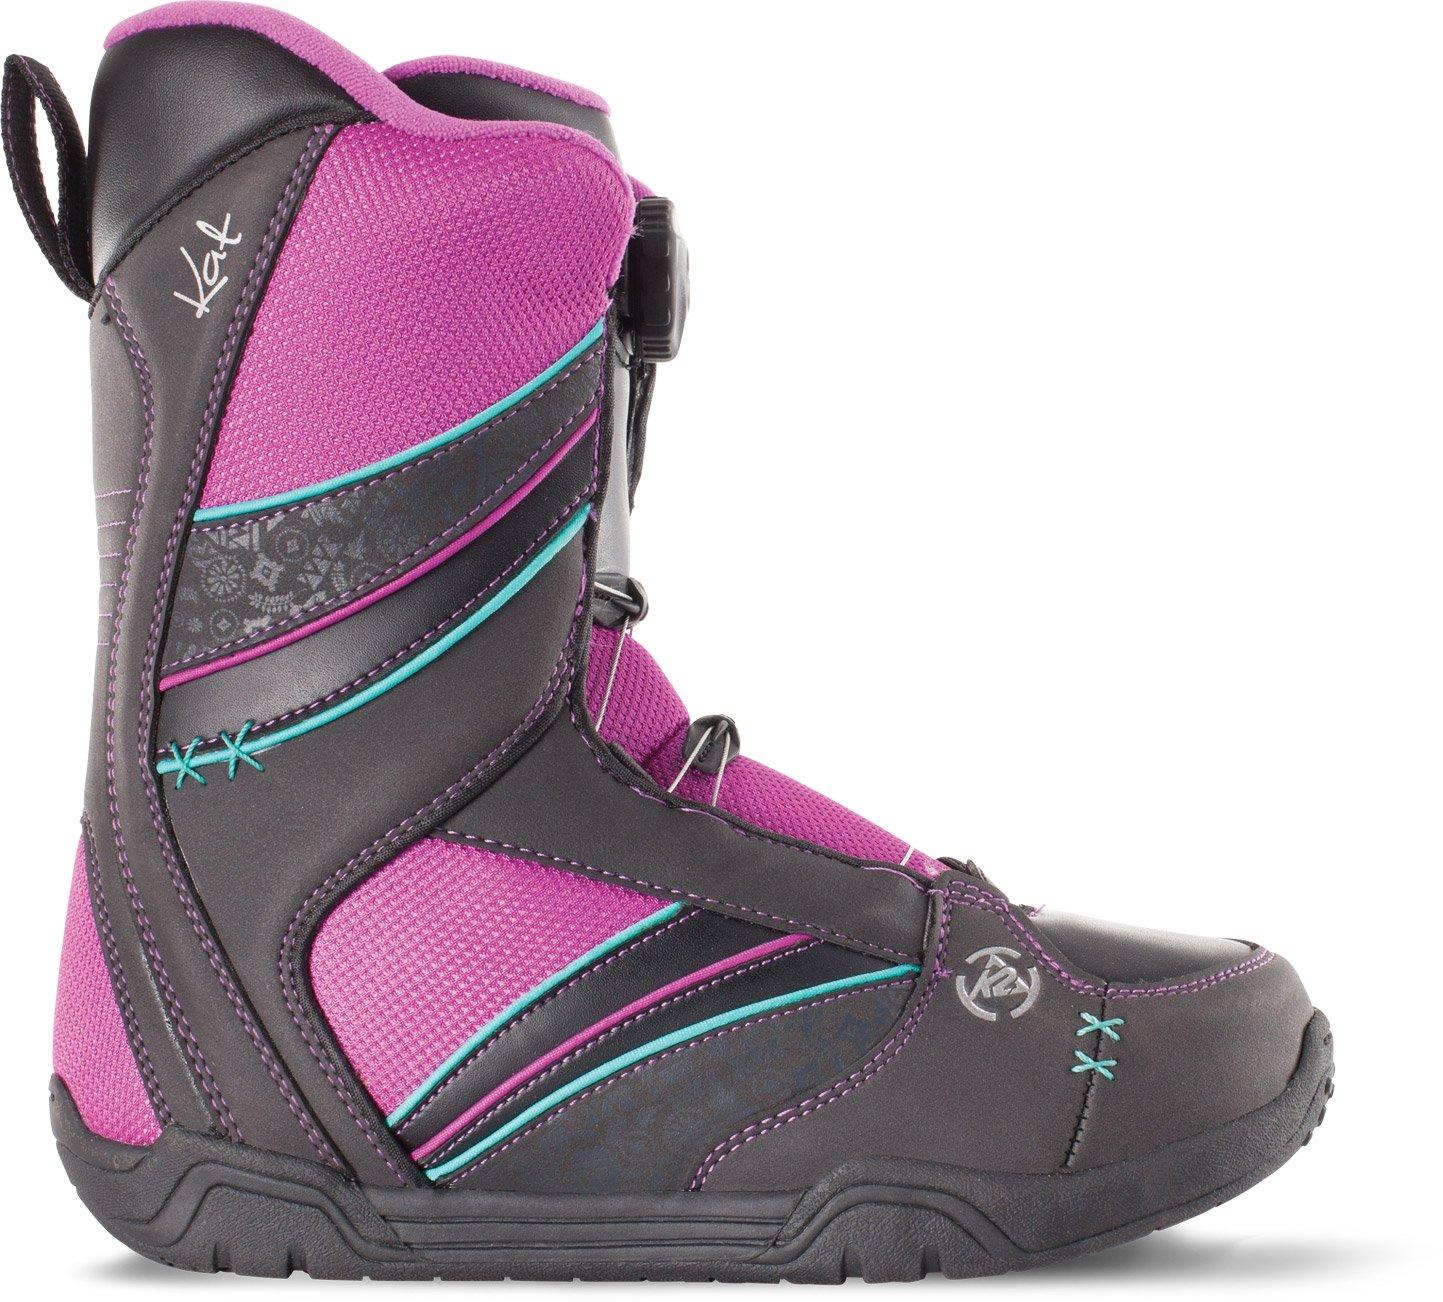 K2 Kat Snowboard Boot 2015, Black, 6